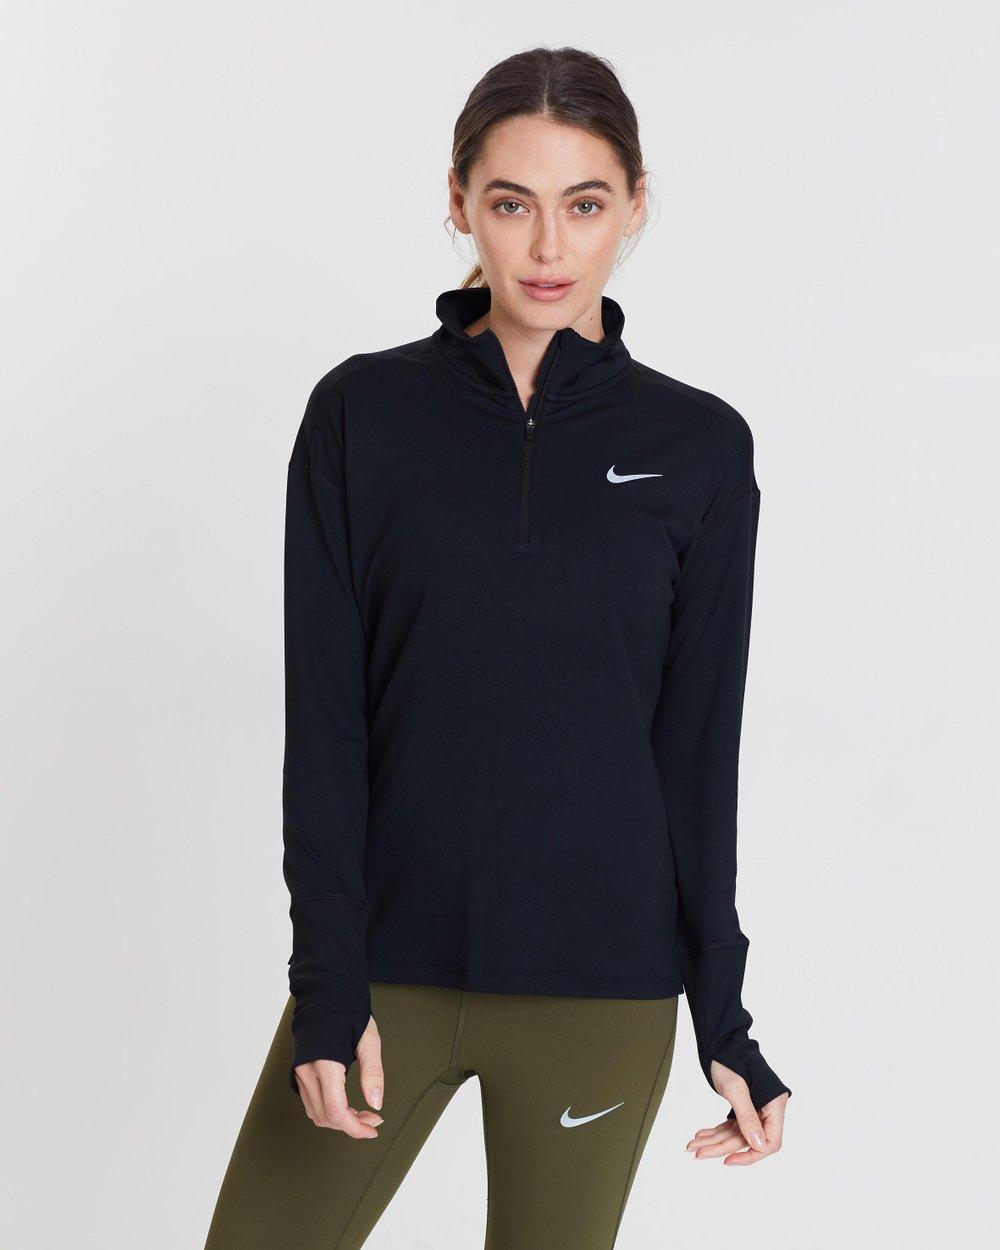 edba48830aa1 Elemental Half Zip Jacket by Nike Online